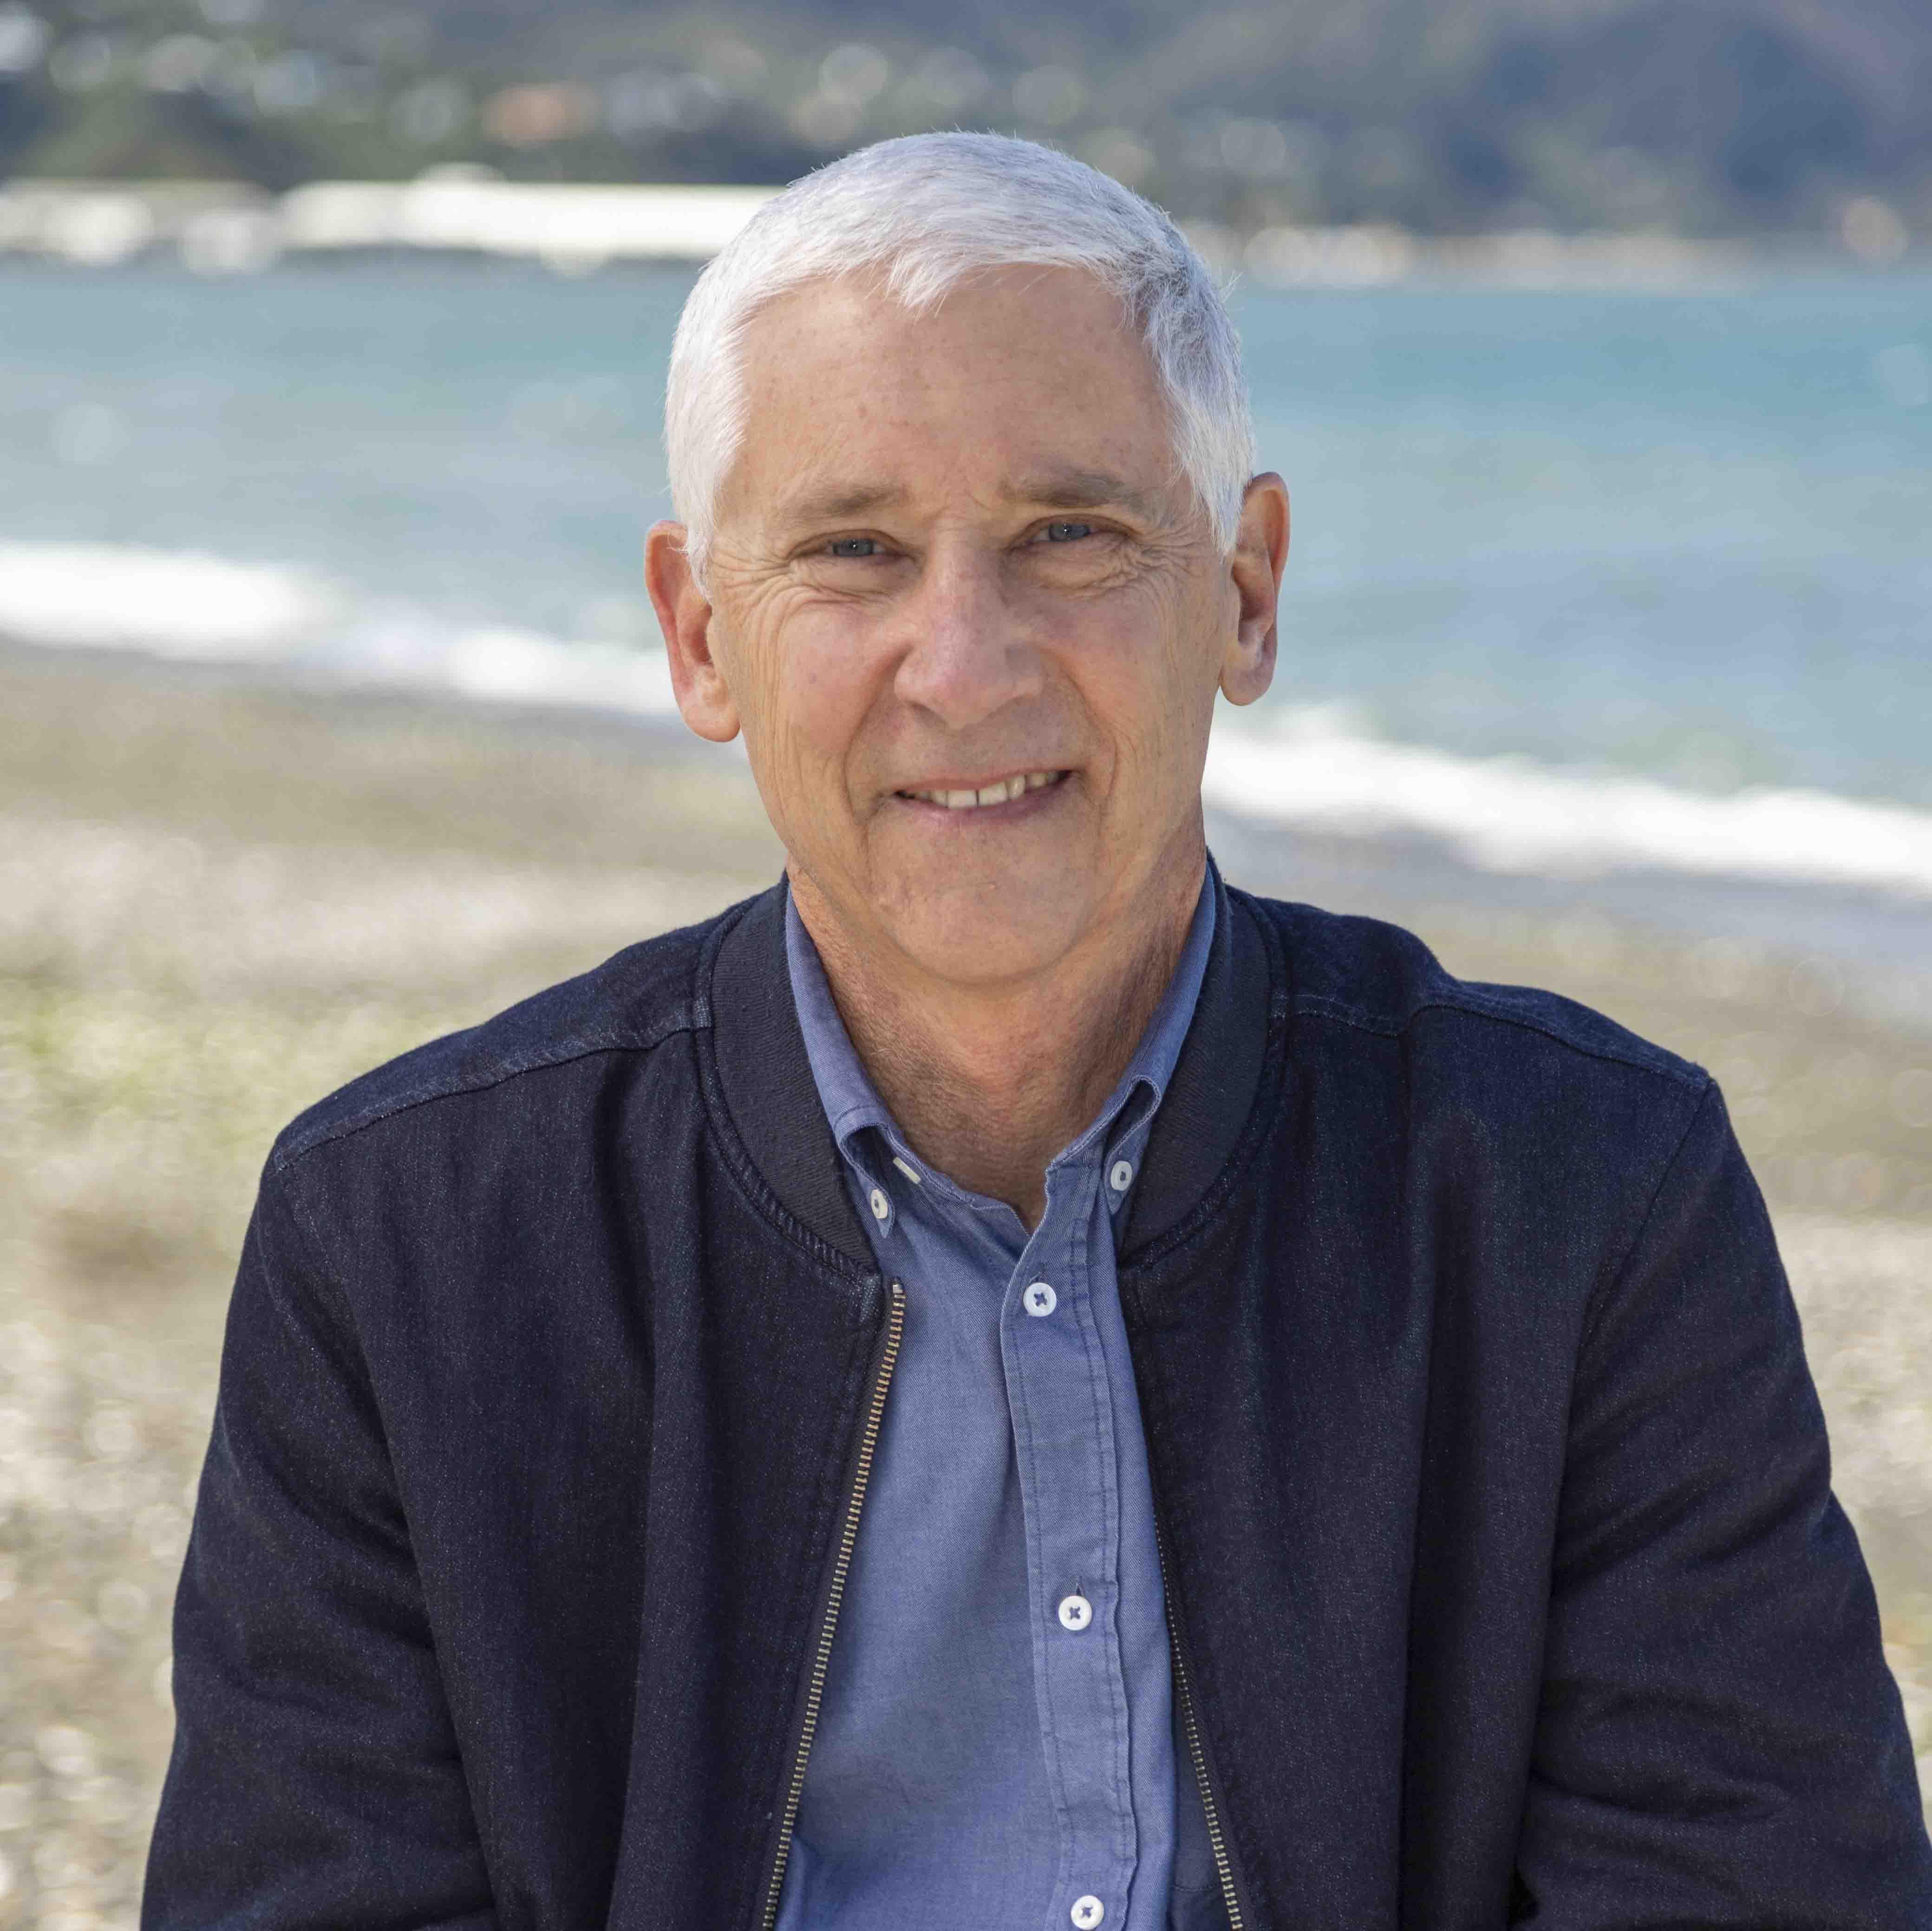 Dave Brinkman